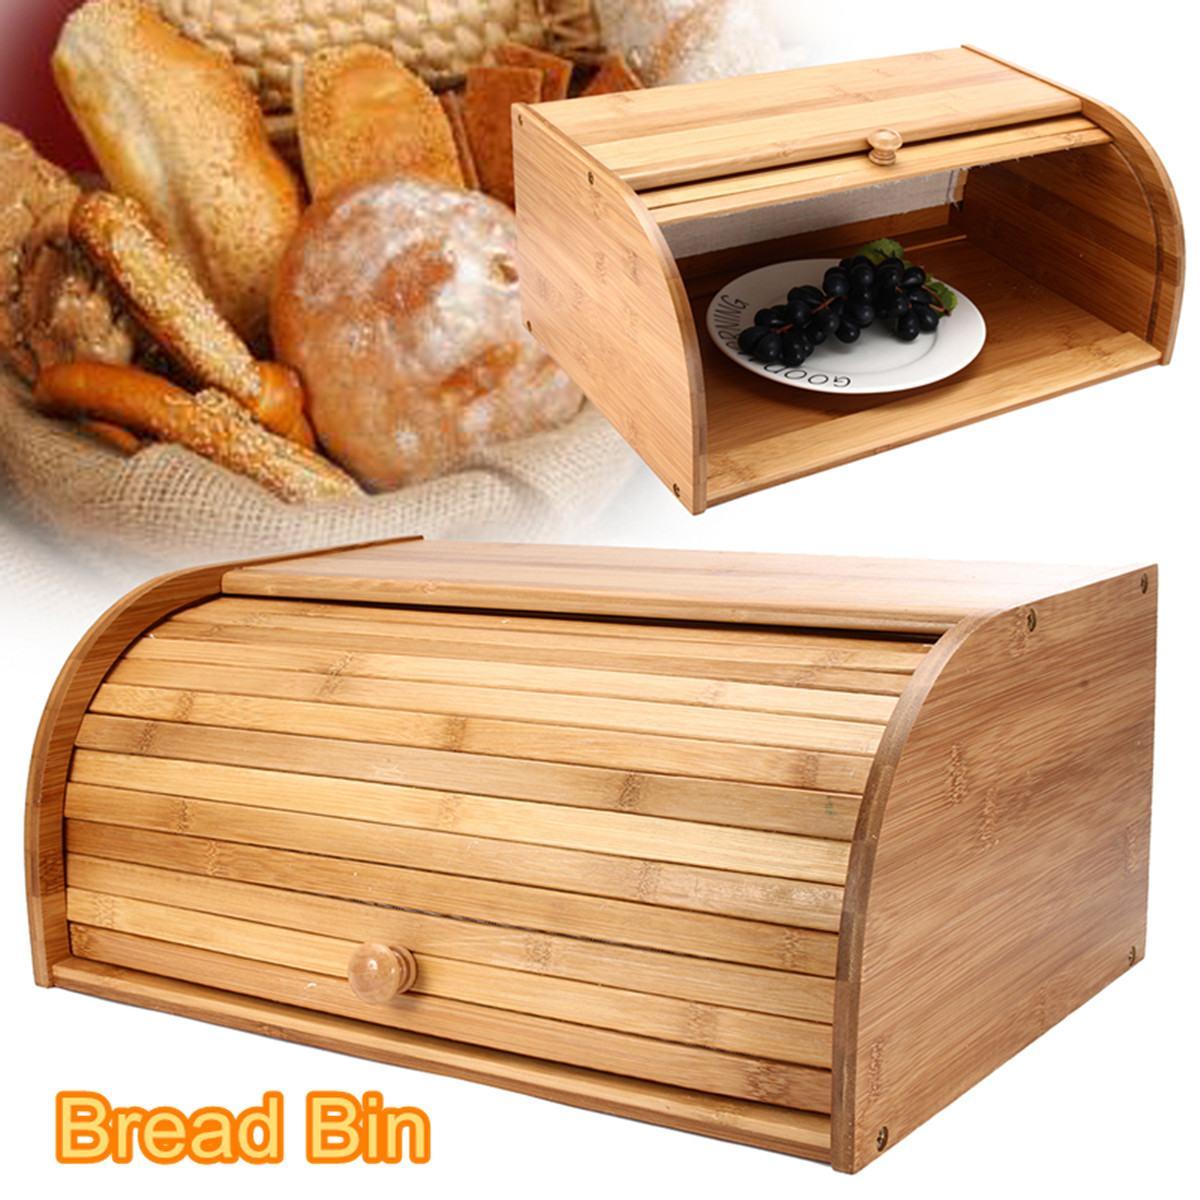 Bamboo Roll Top Wooden Loaf Bread Bin Kitchen Food Storage Box Container Organizer Household Organizer Snack Box 40X27X17cm